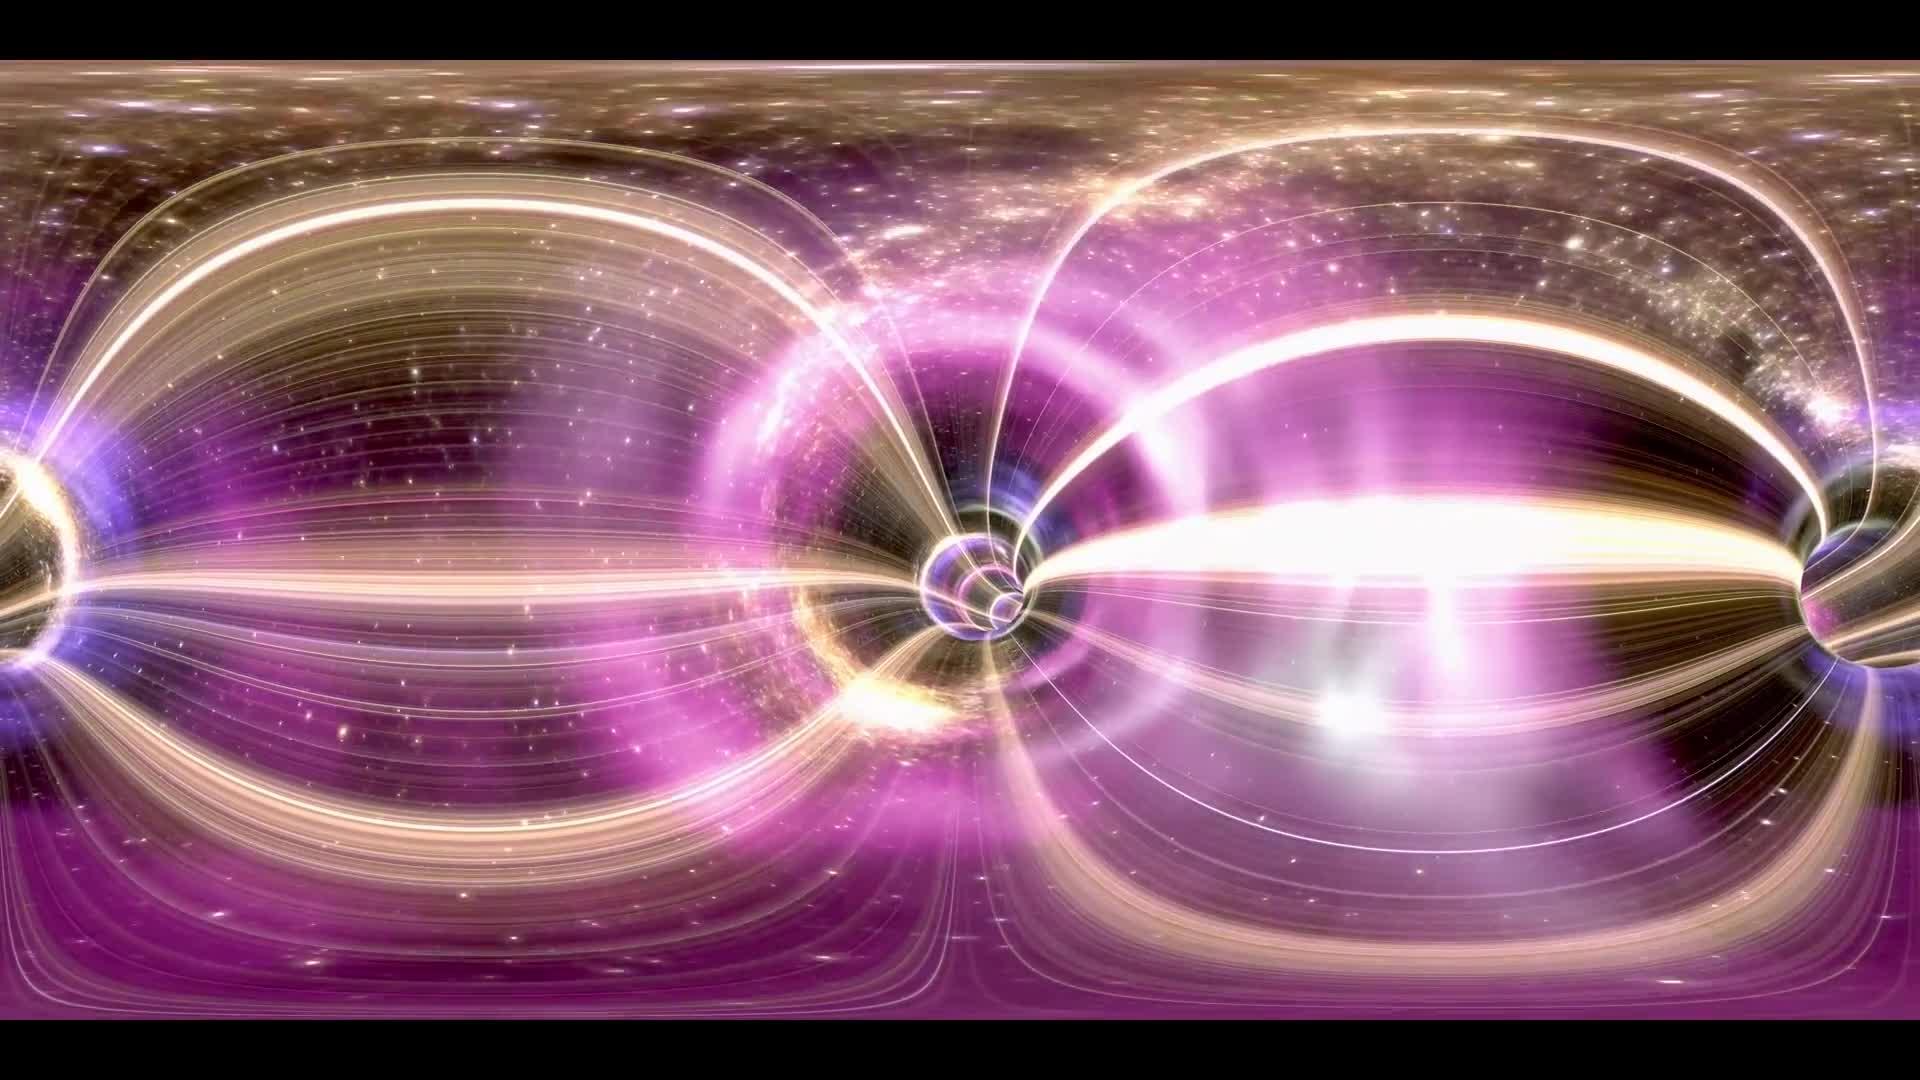 360VR Video wormhole cosmic tunnel in space, loop